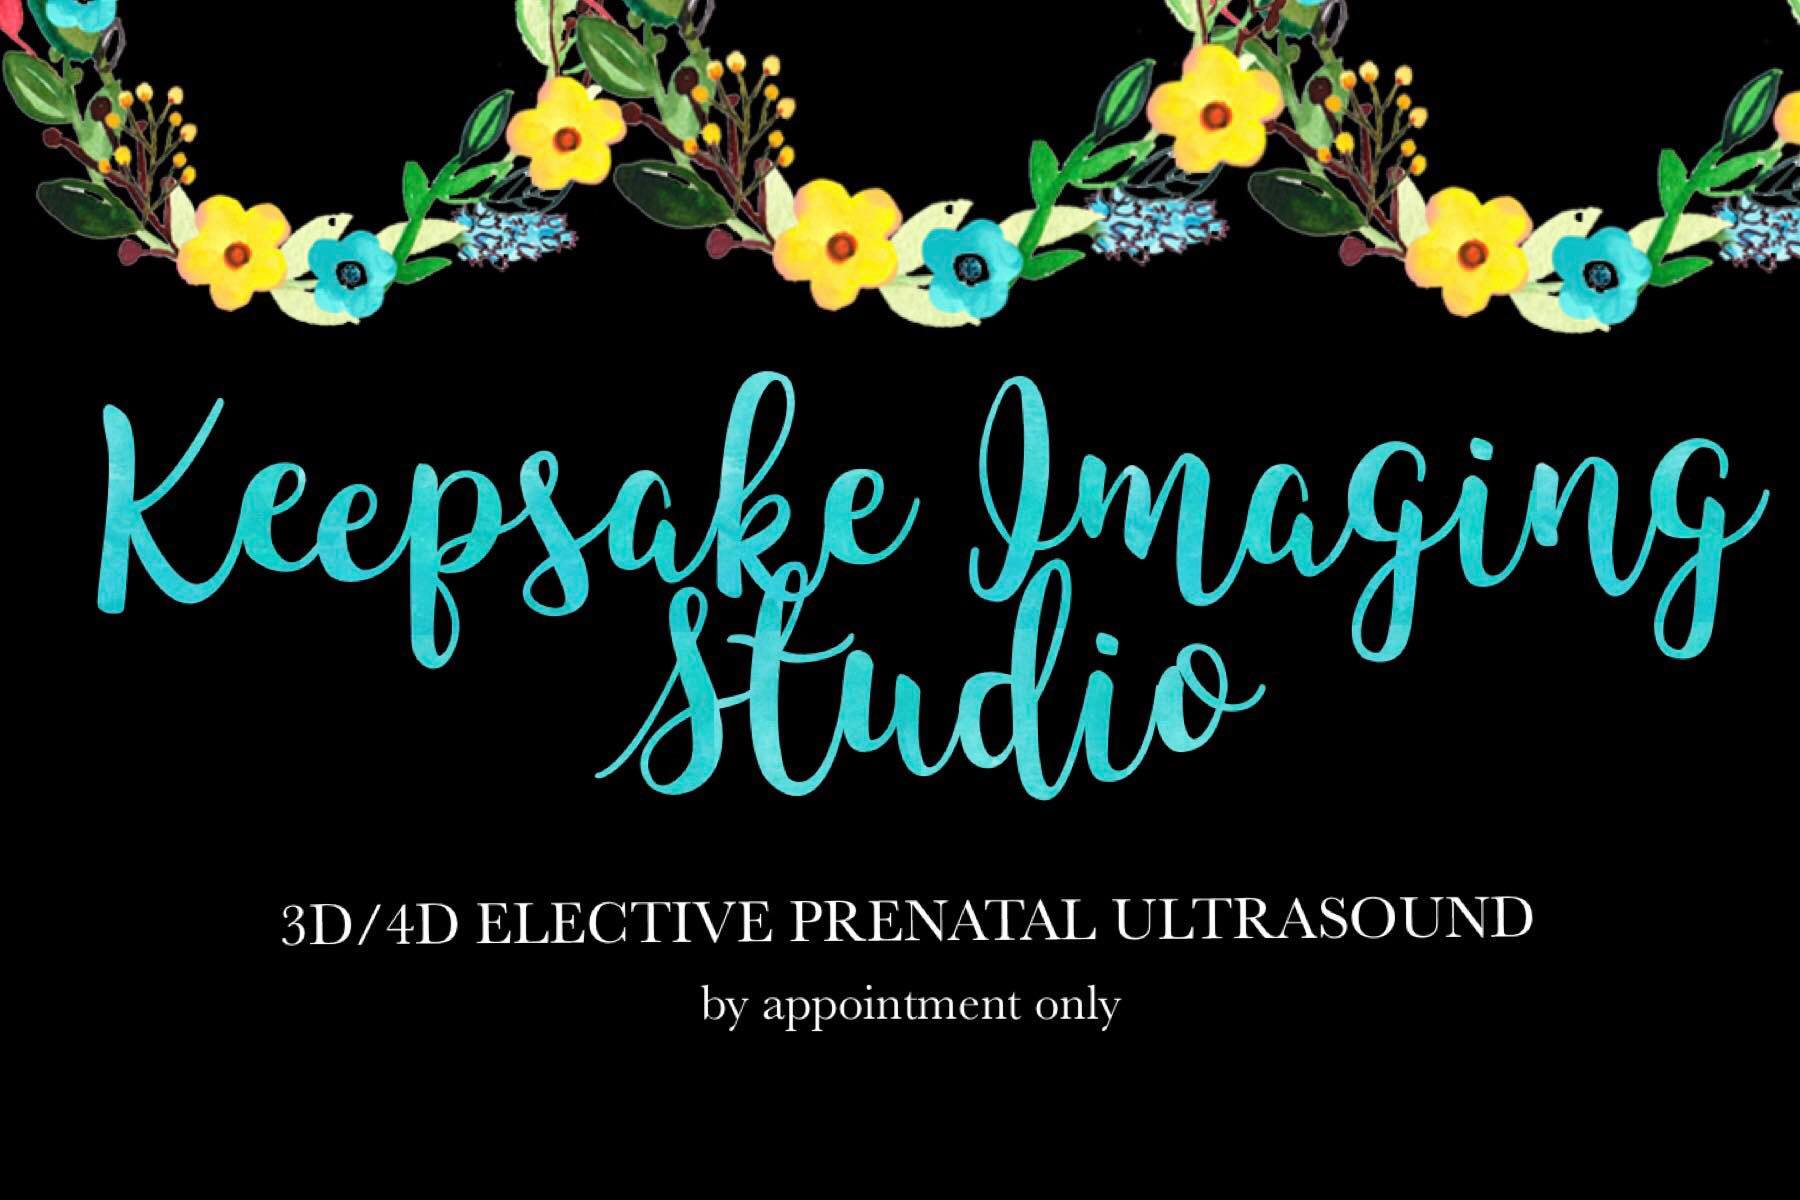 Keepsake Imaging Studio